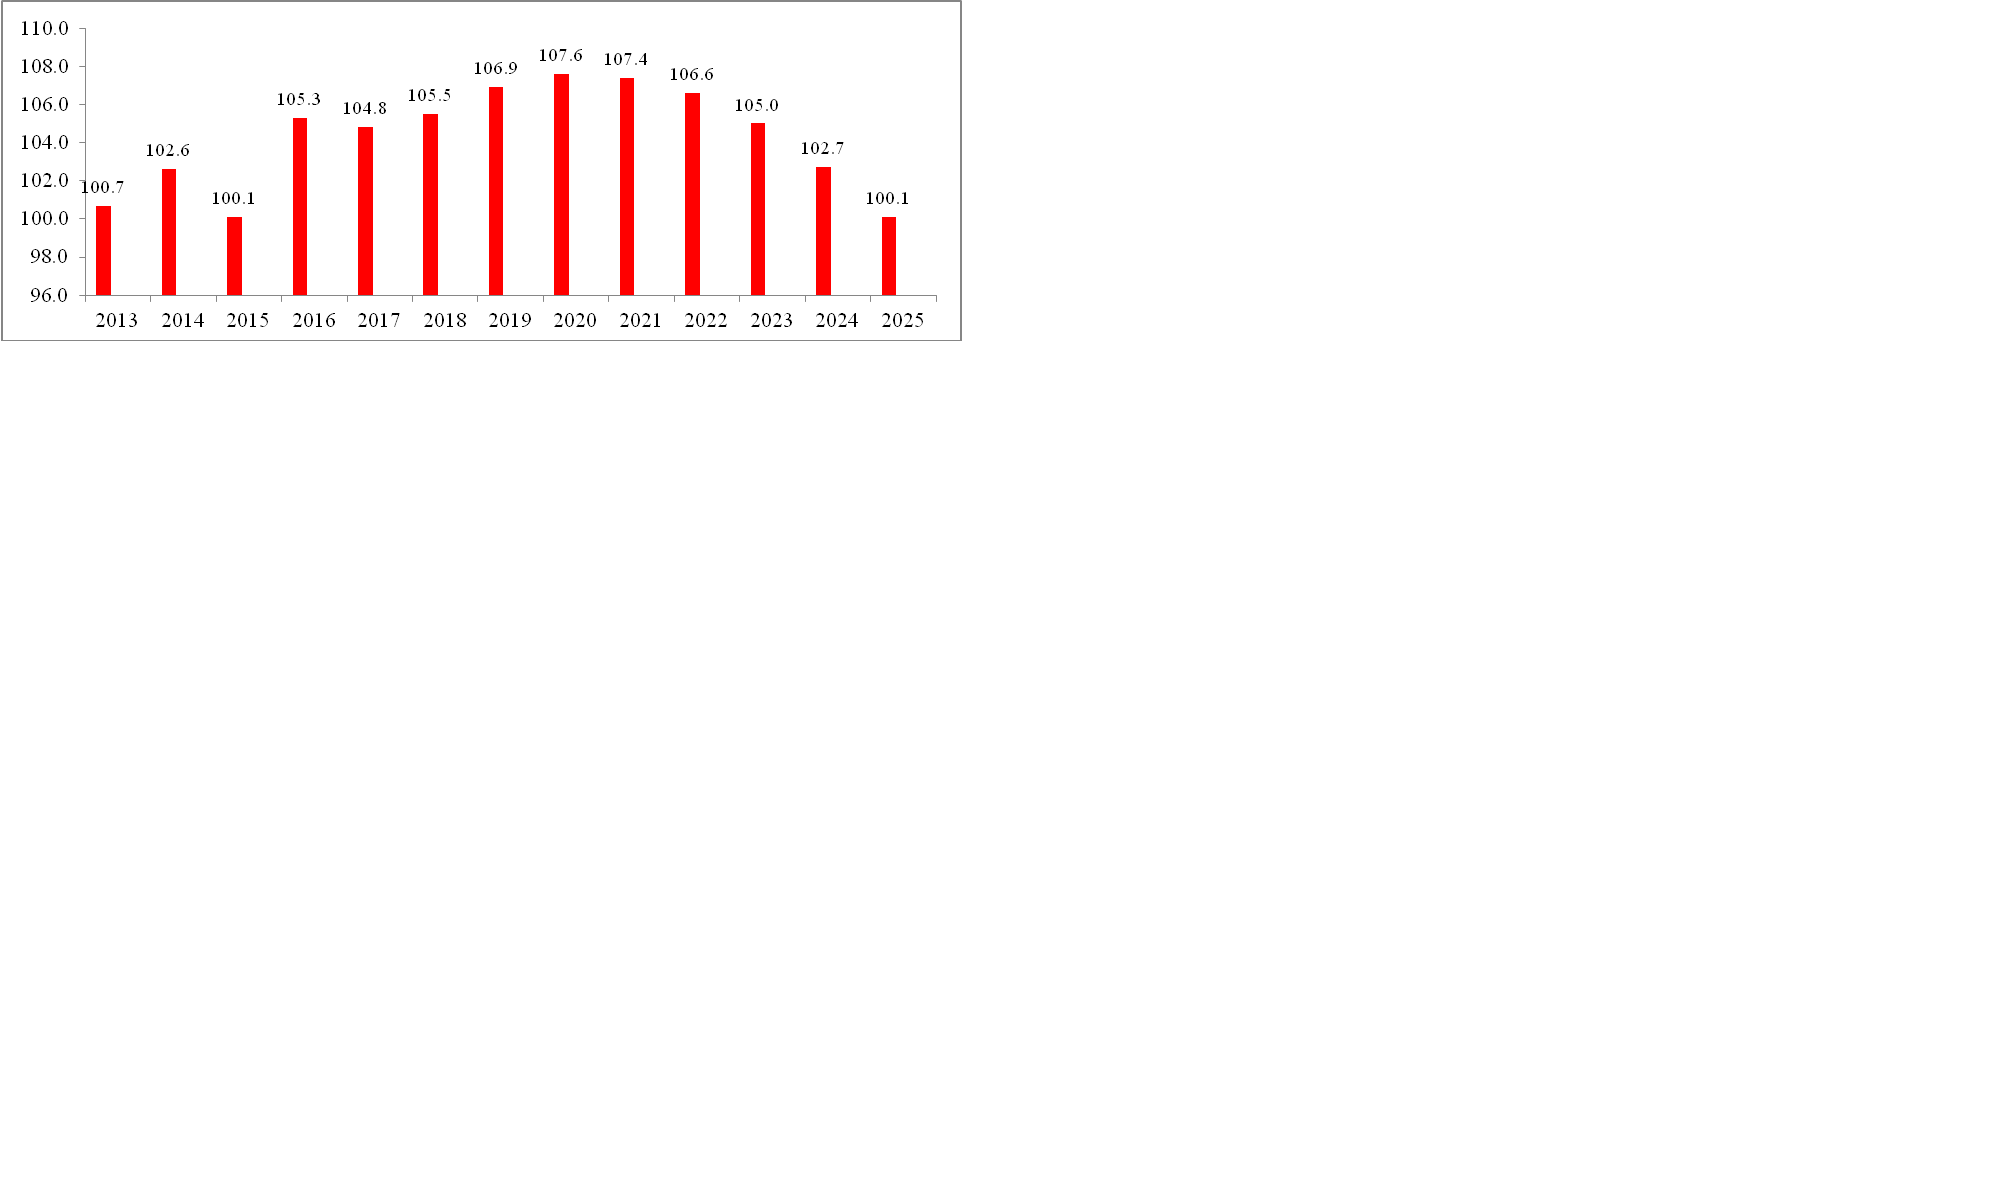 Рисунок 2 Совокупный федеральный долг США с 2016 по 2025 г., % ВВП    Fiscal Year 2021, Historical Tables, Budget of the U.S. Government, Office of Management and Budget/ Table 7.1